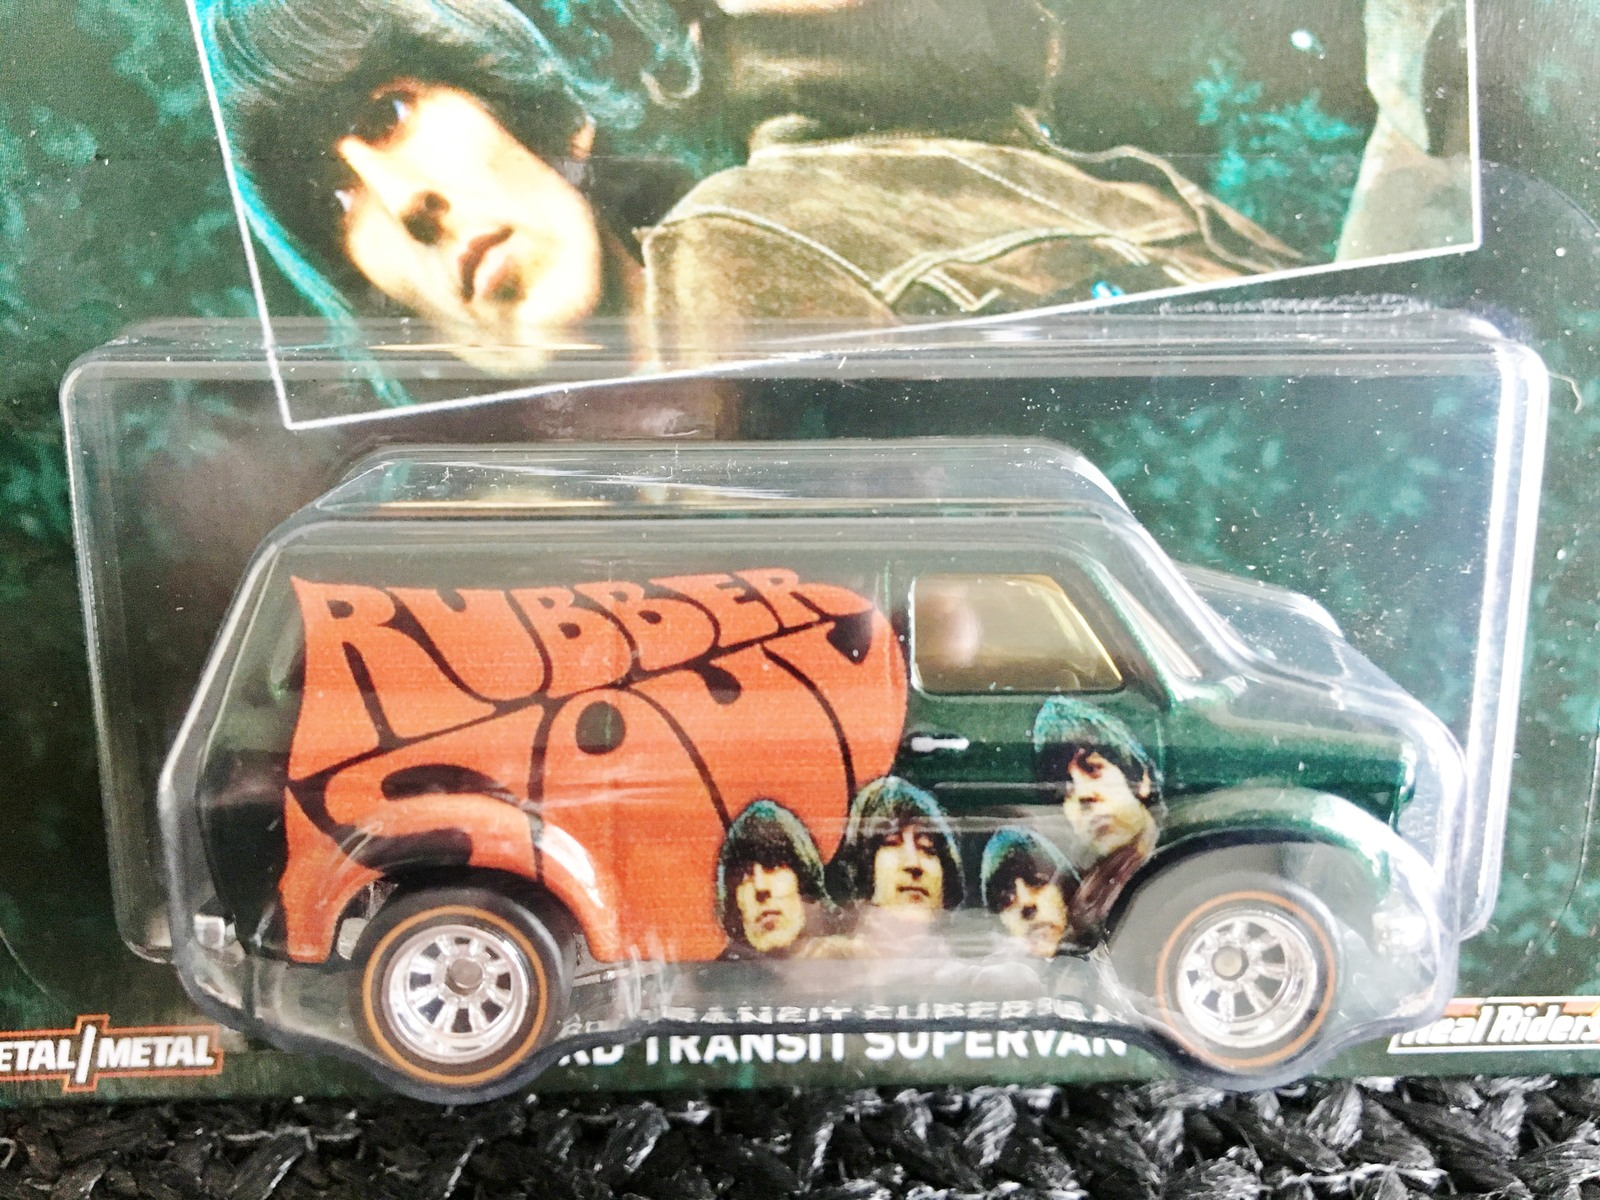 Hot Wheels The Beatles ALBUM RUBBER SOUL FORD TRANSIT SUPERVAN Metal RealRider